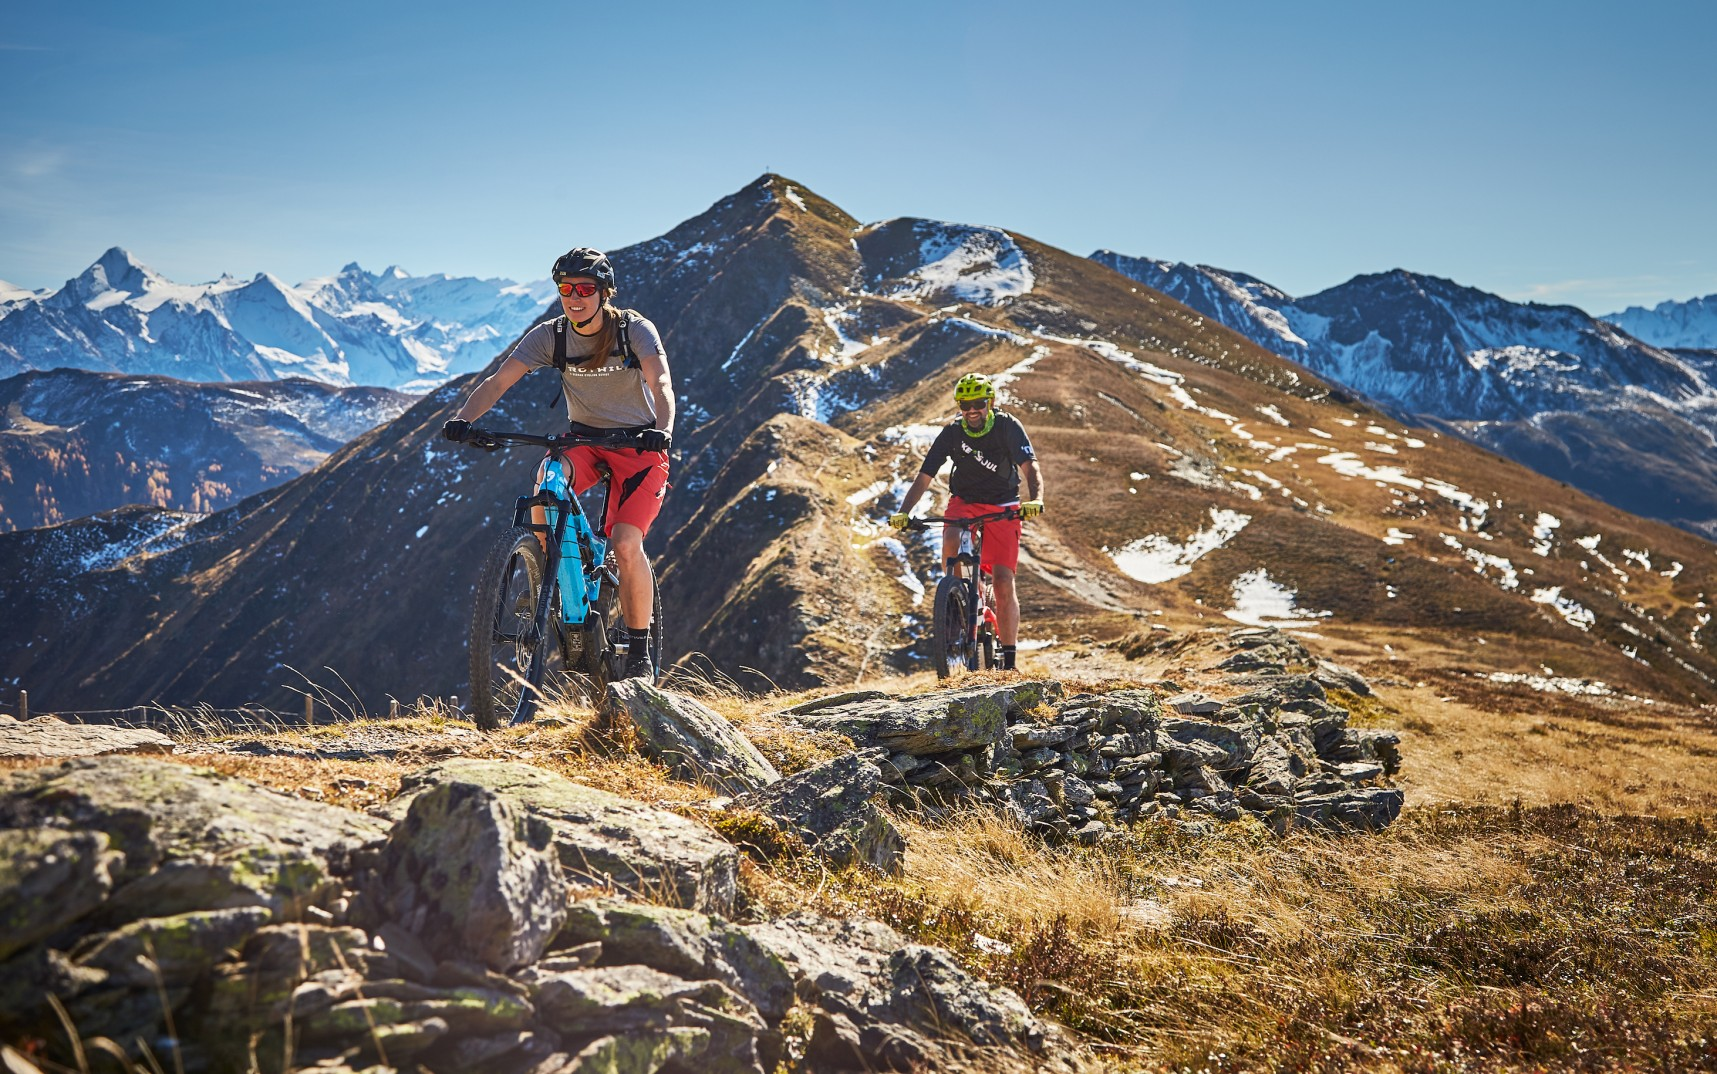 Mountainbiken, Downhill, Cross Country im Bikecircus Saalbach-Hinterglemm